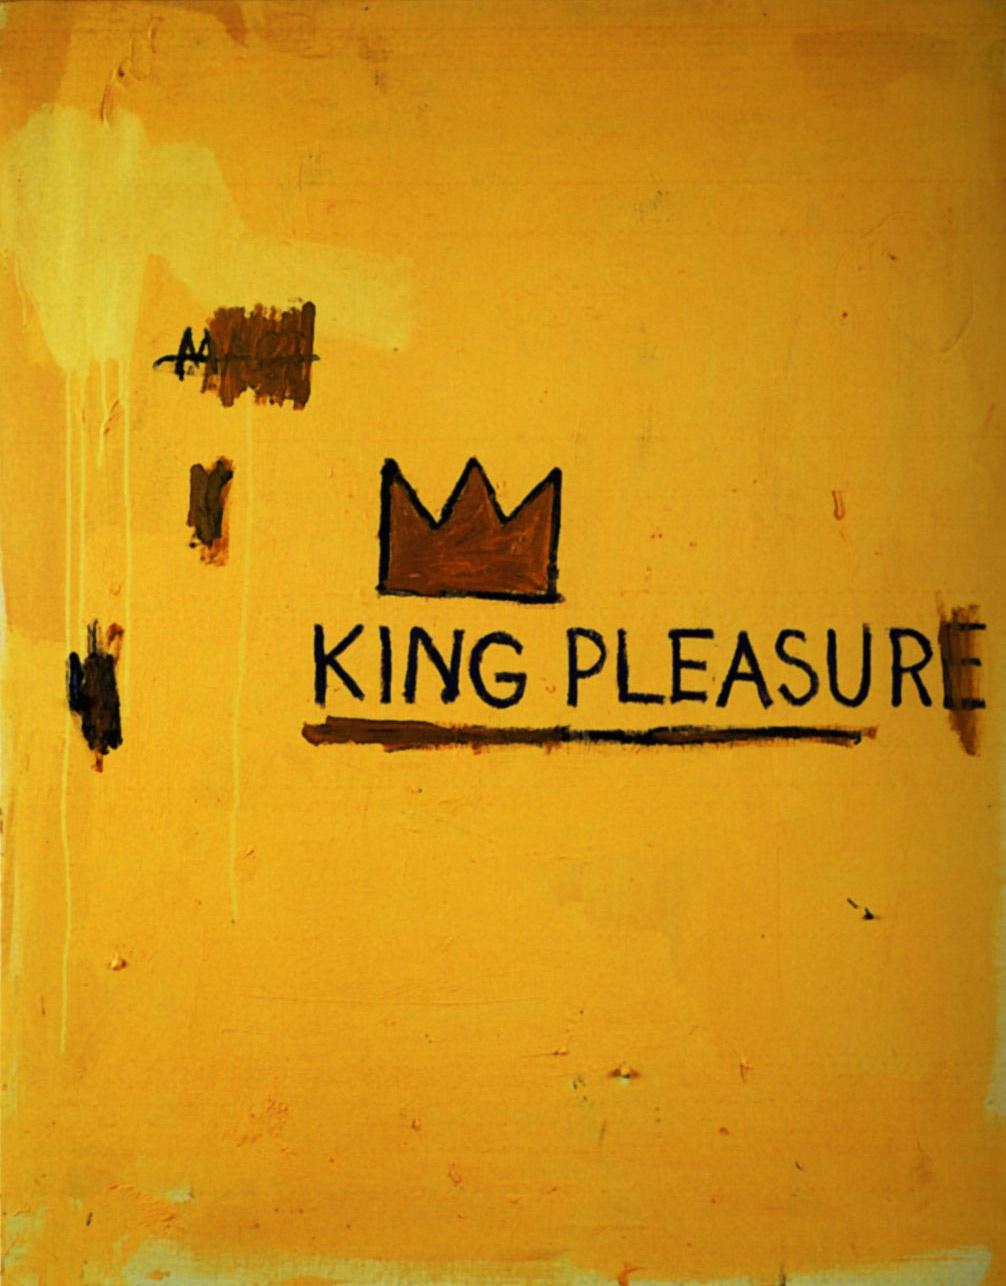 Jean-Michel Basquiat. The king of pleasure